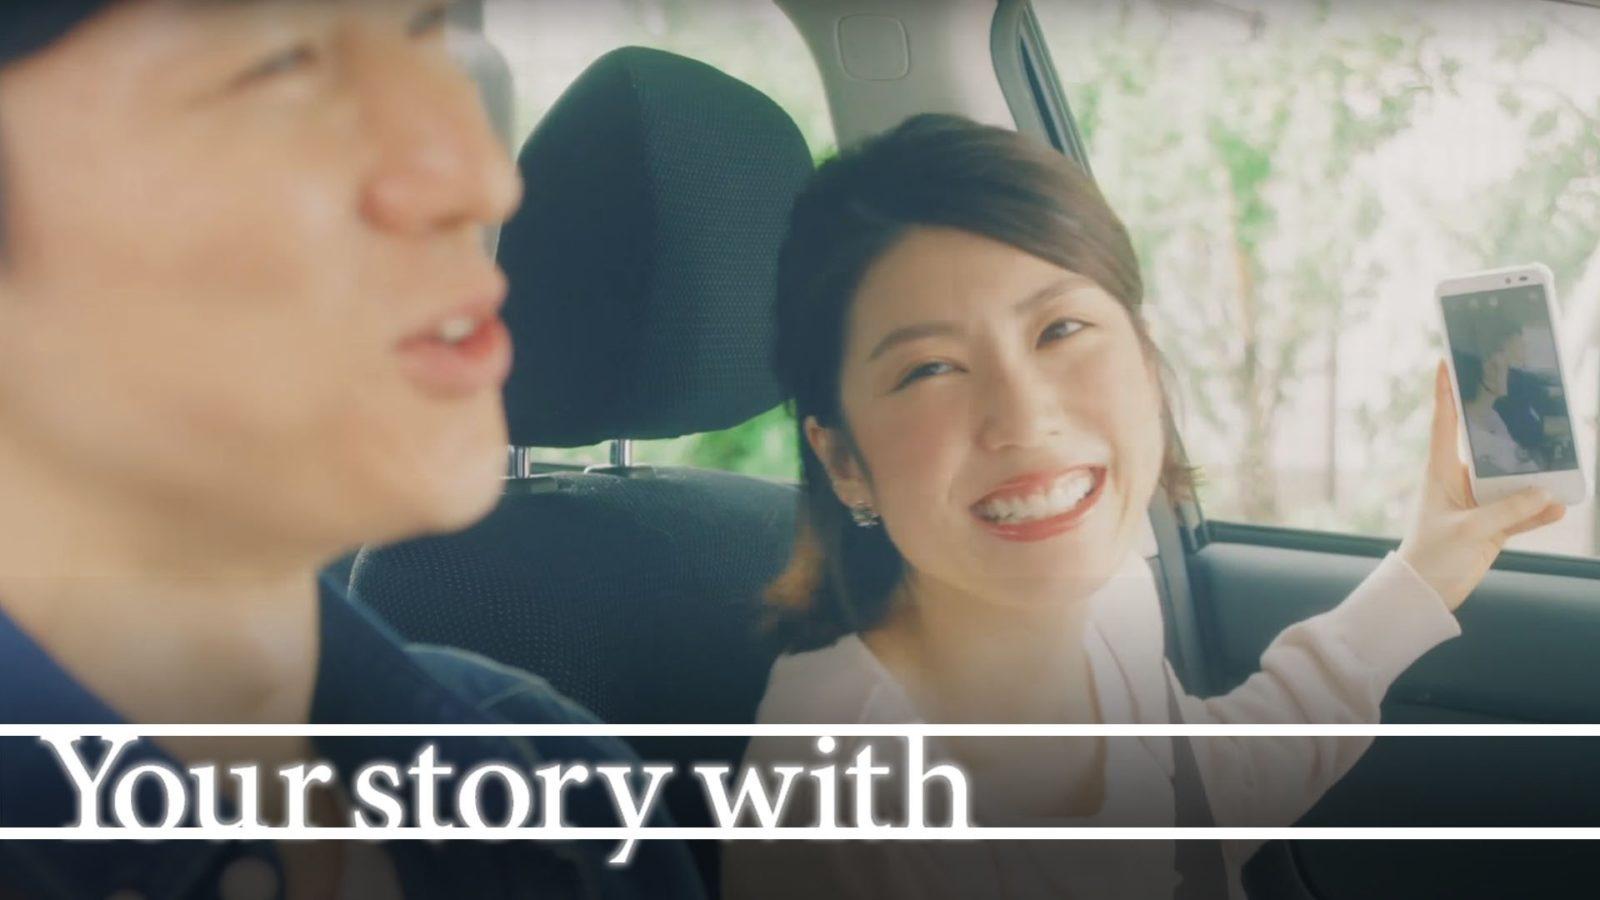 SUBARU『Your story withー助手席篇』